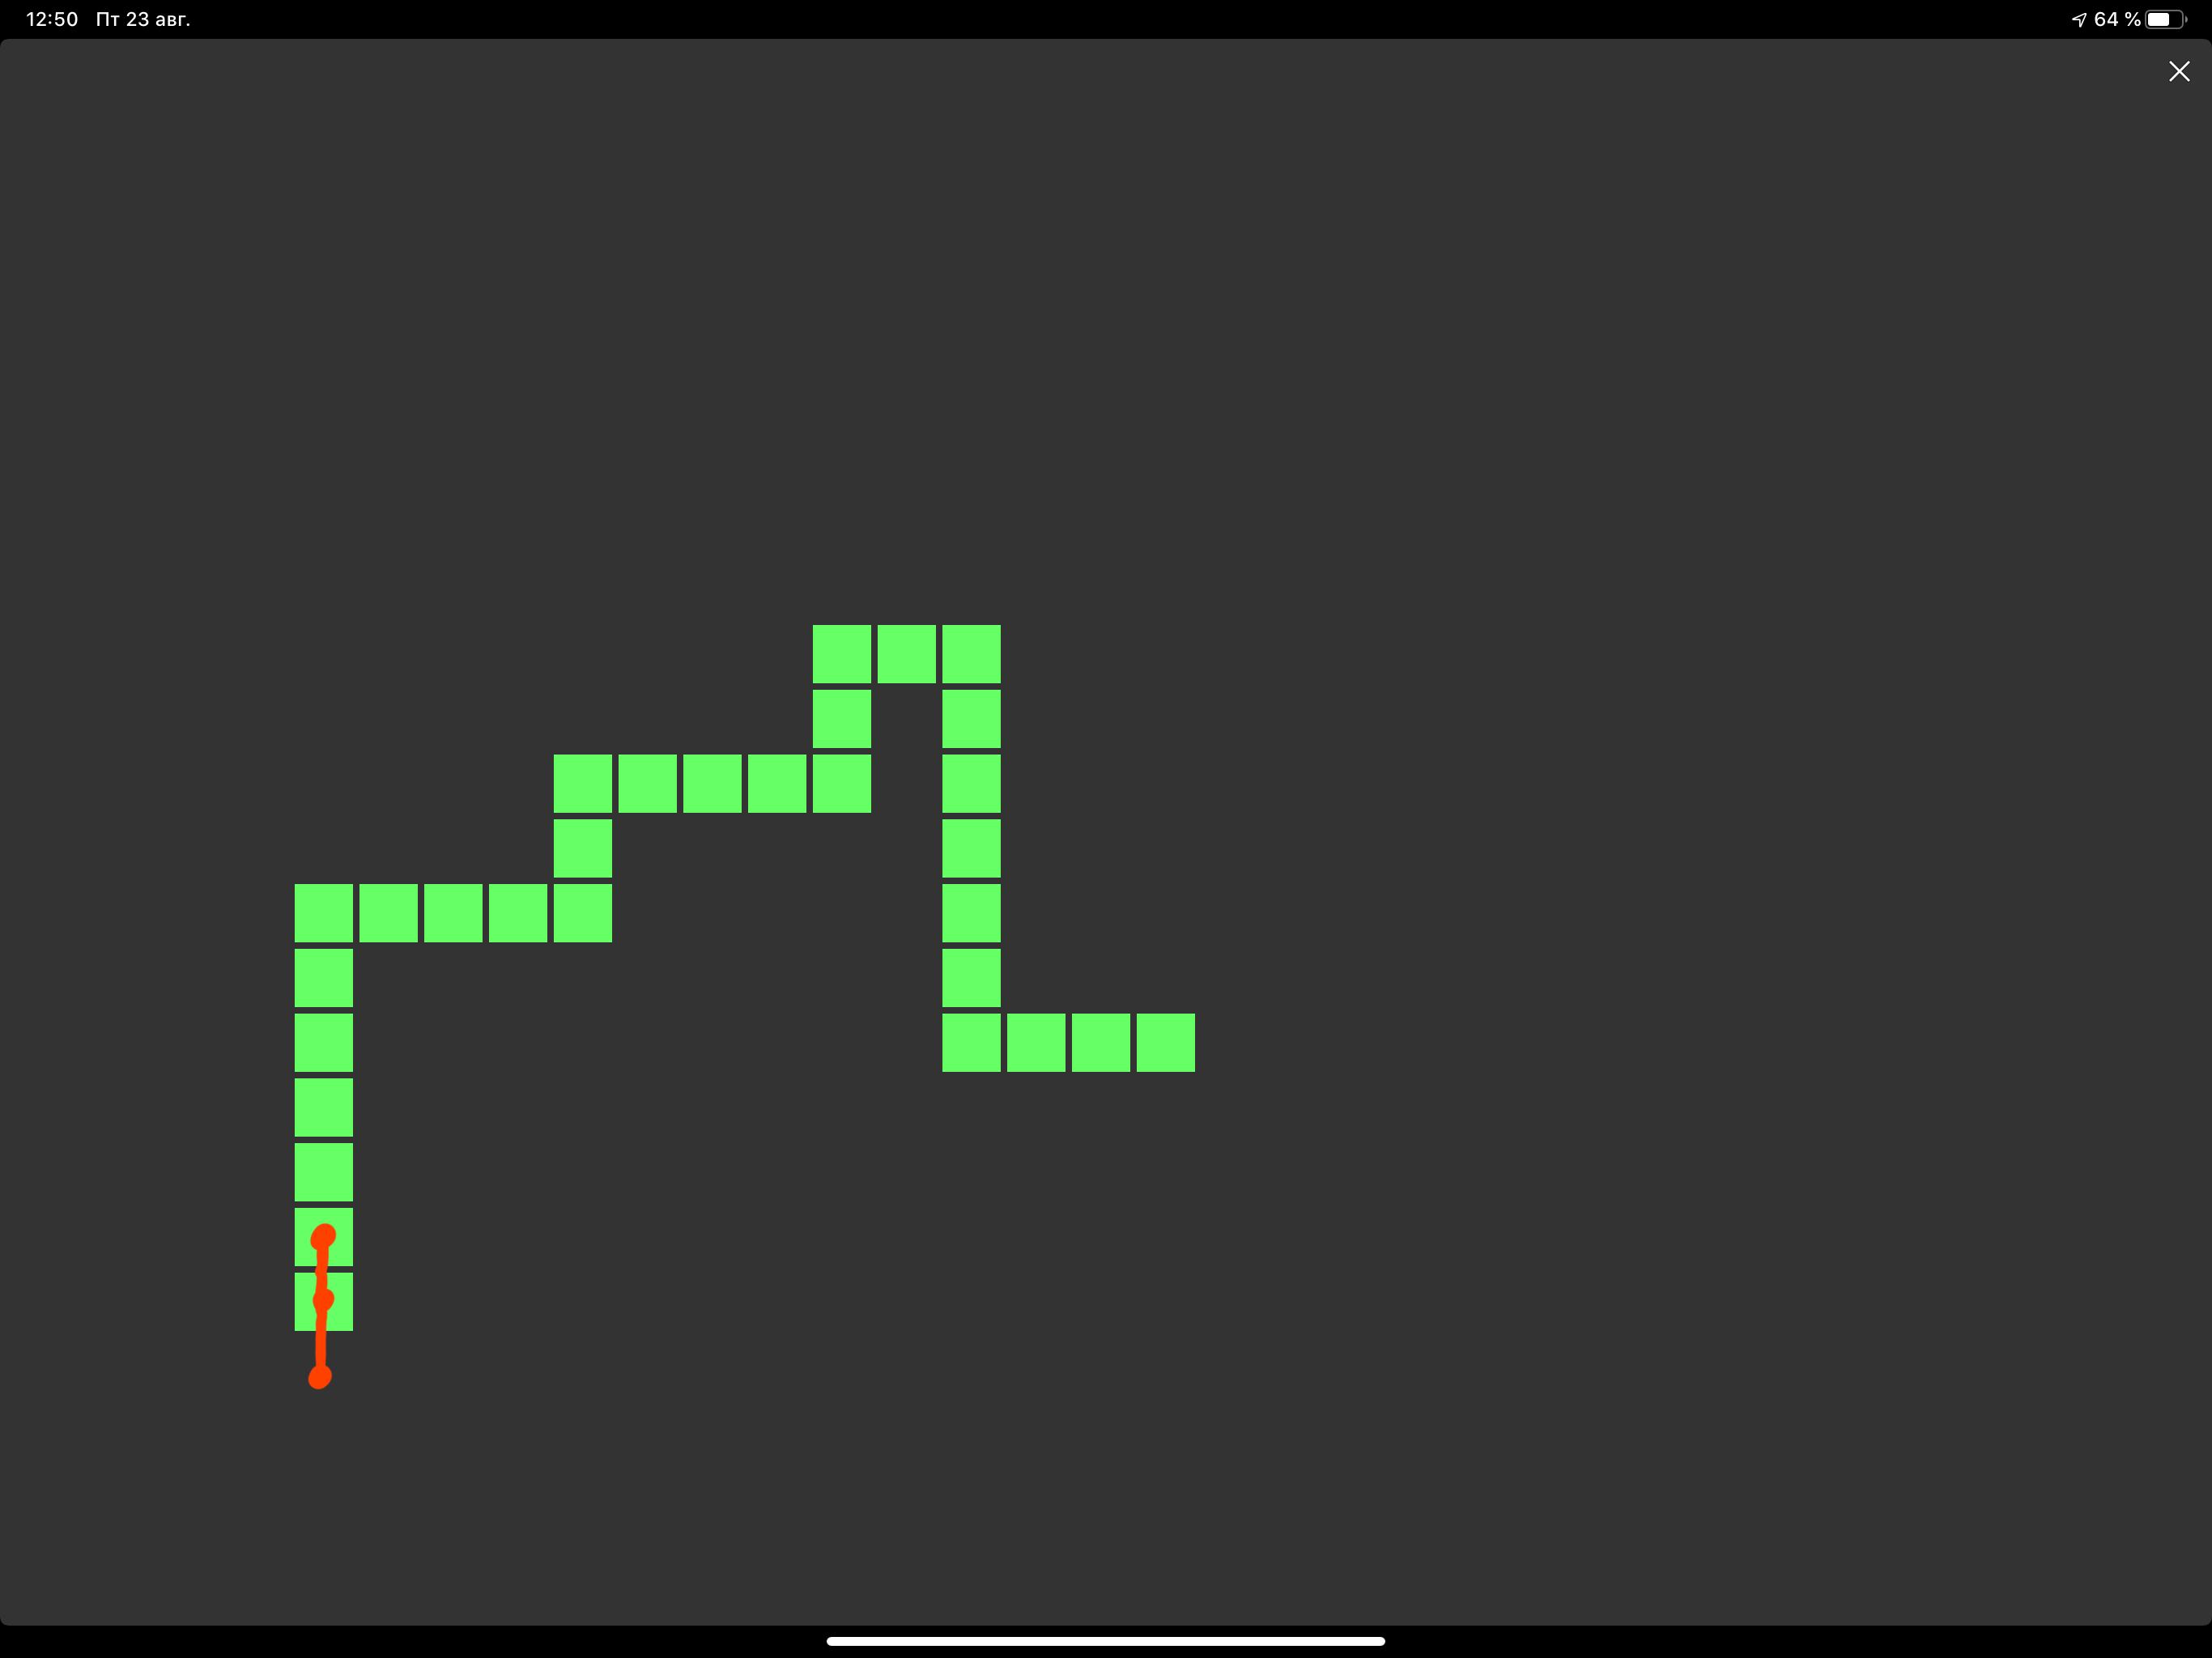 Написание змейки на ipad (pythonista) - 15